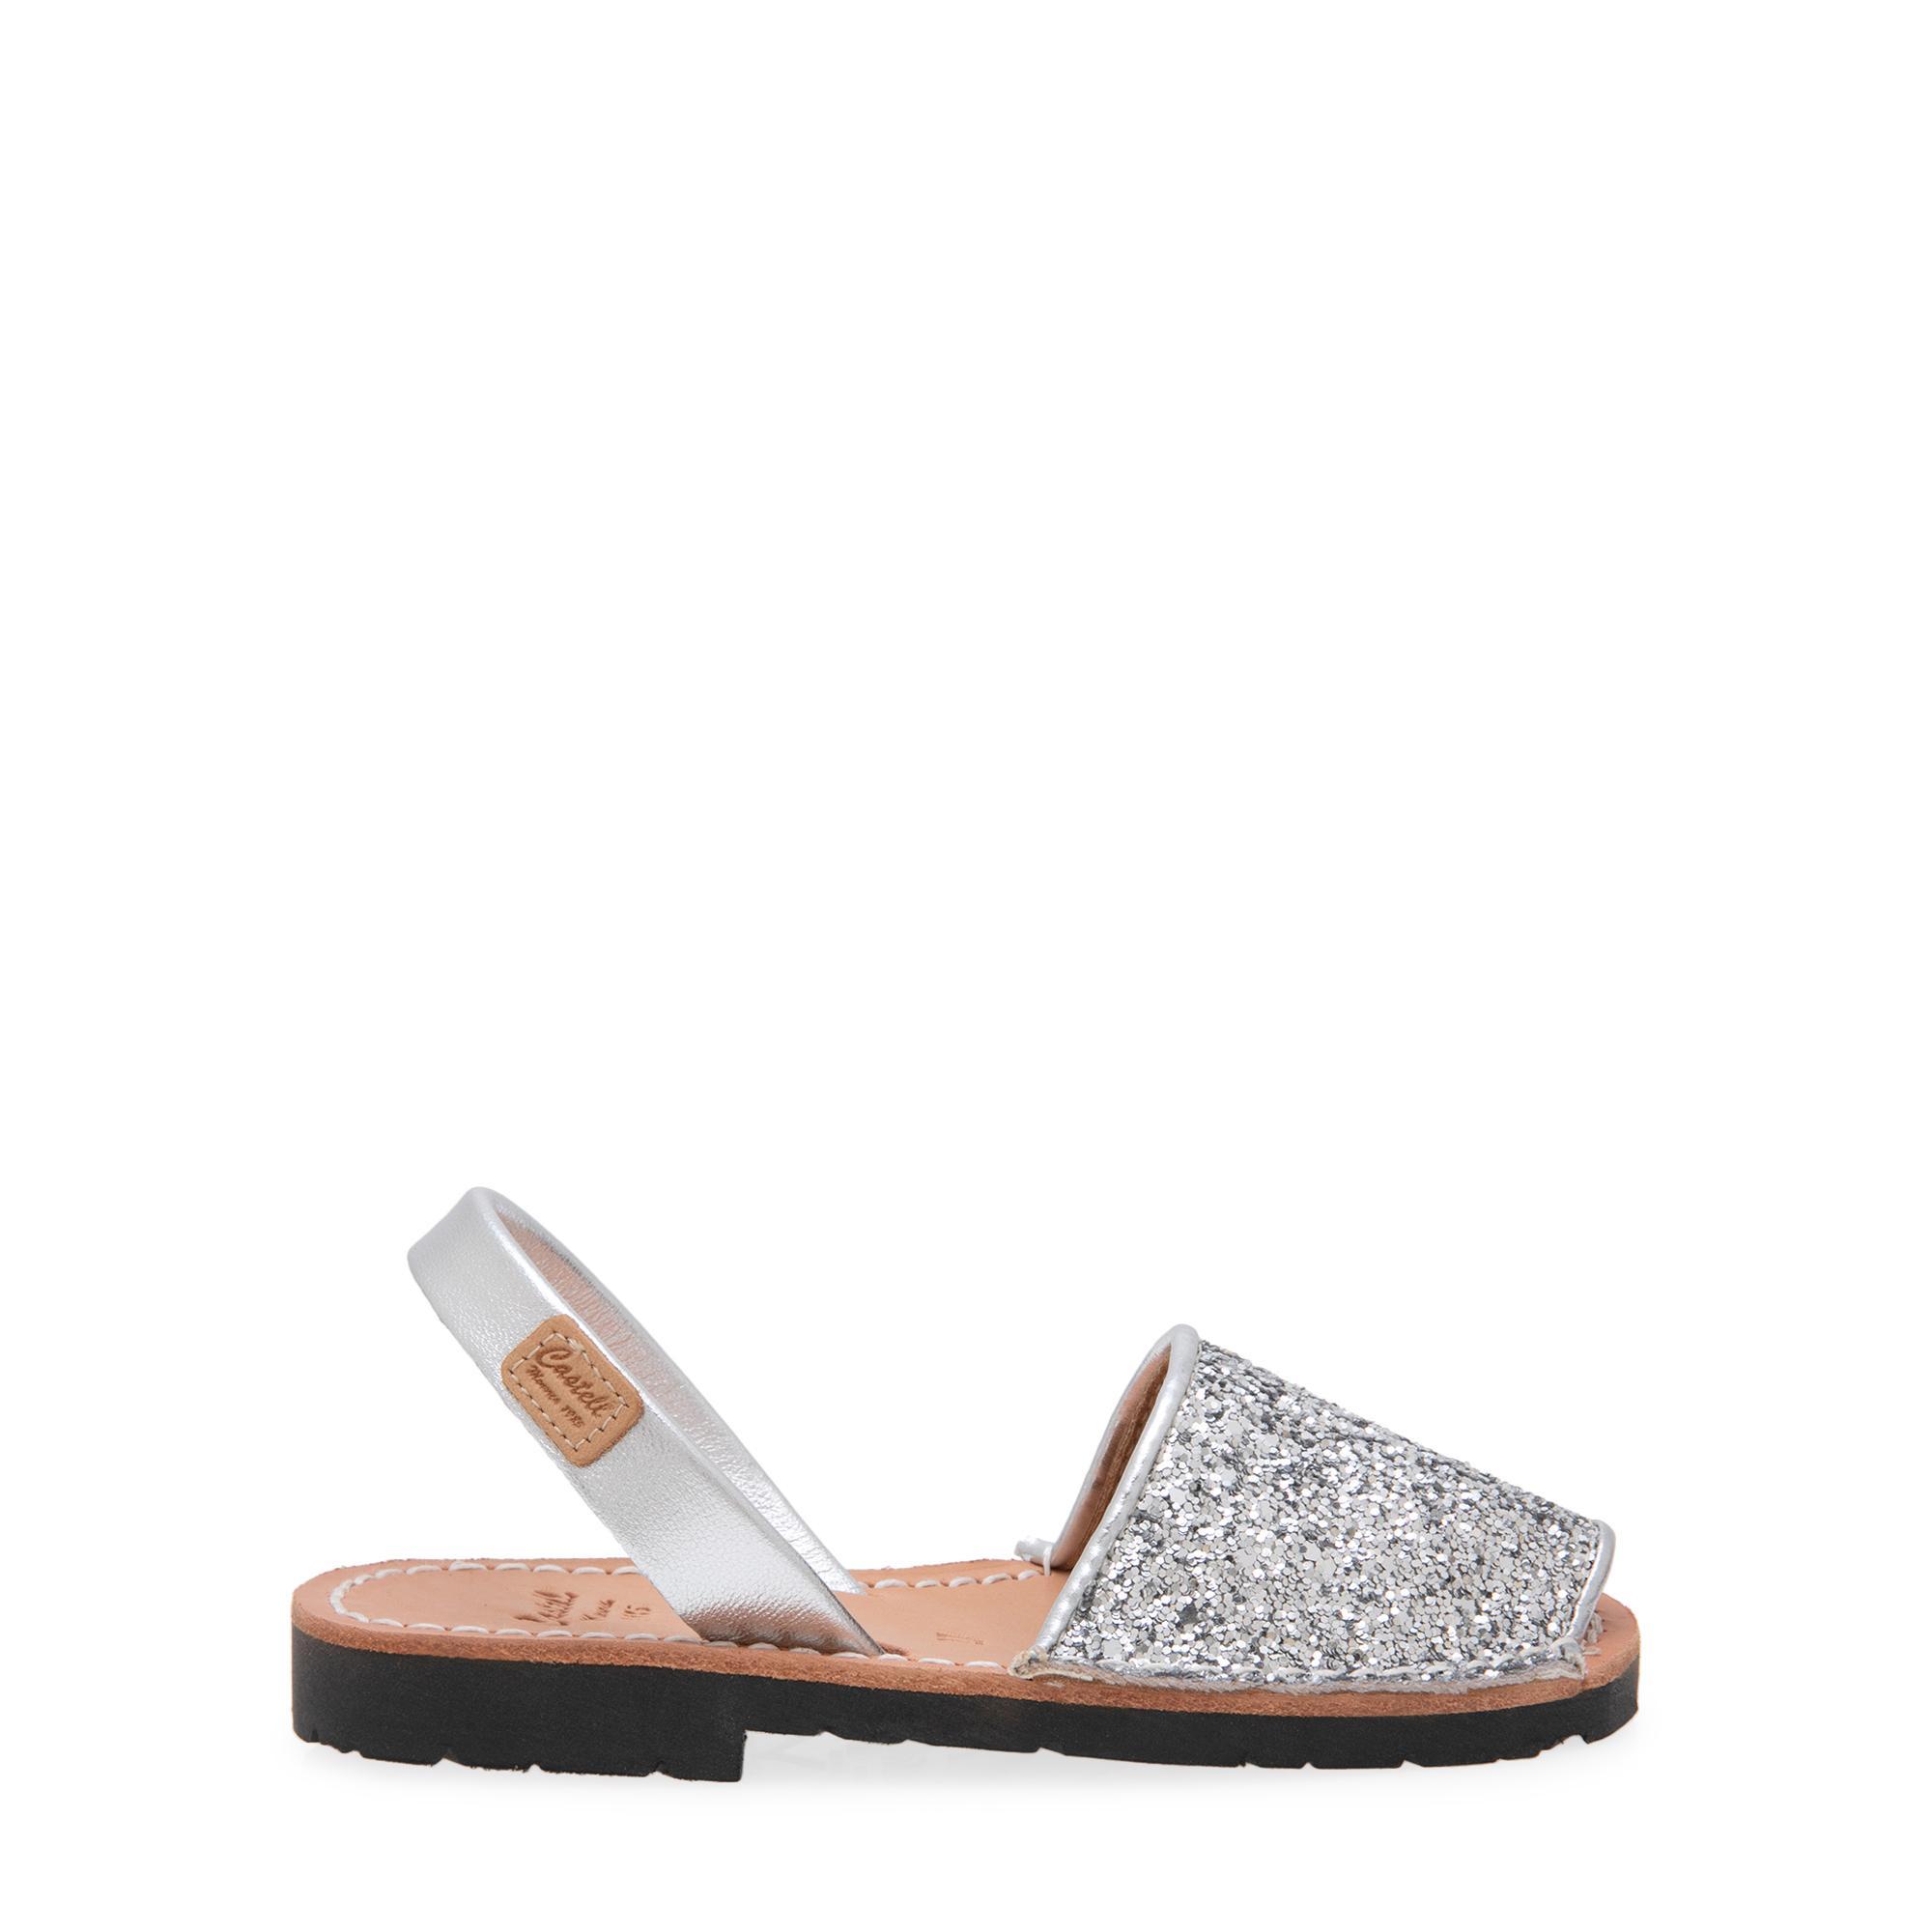 Madona glitter sandals